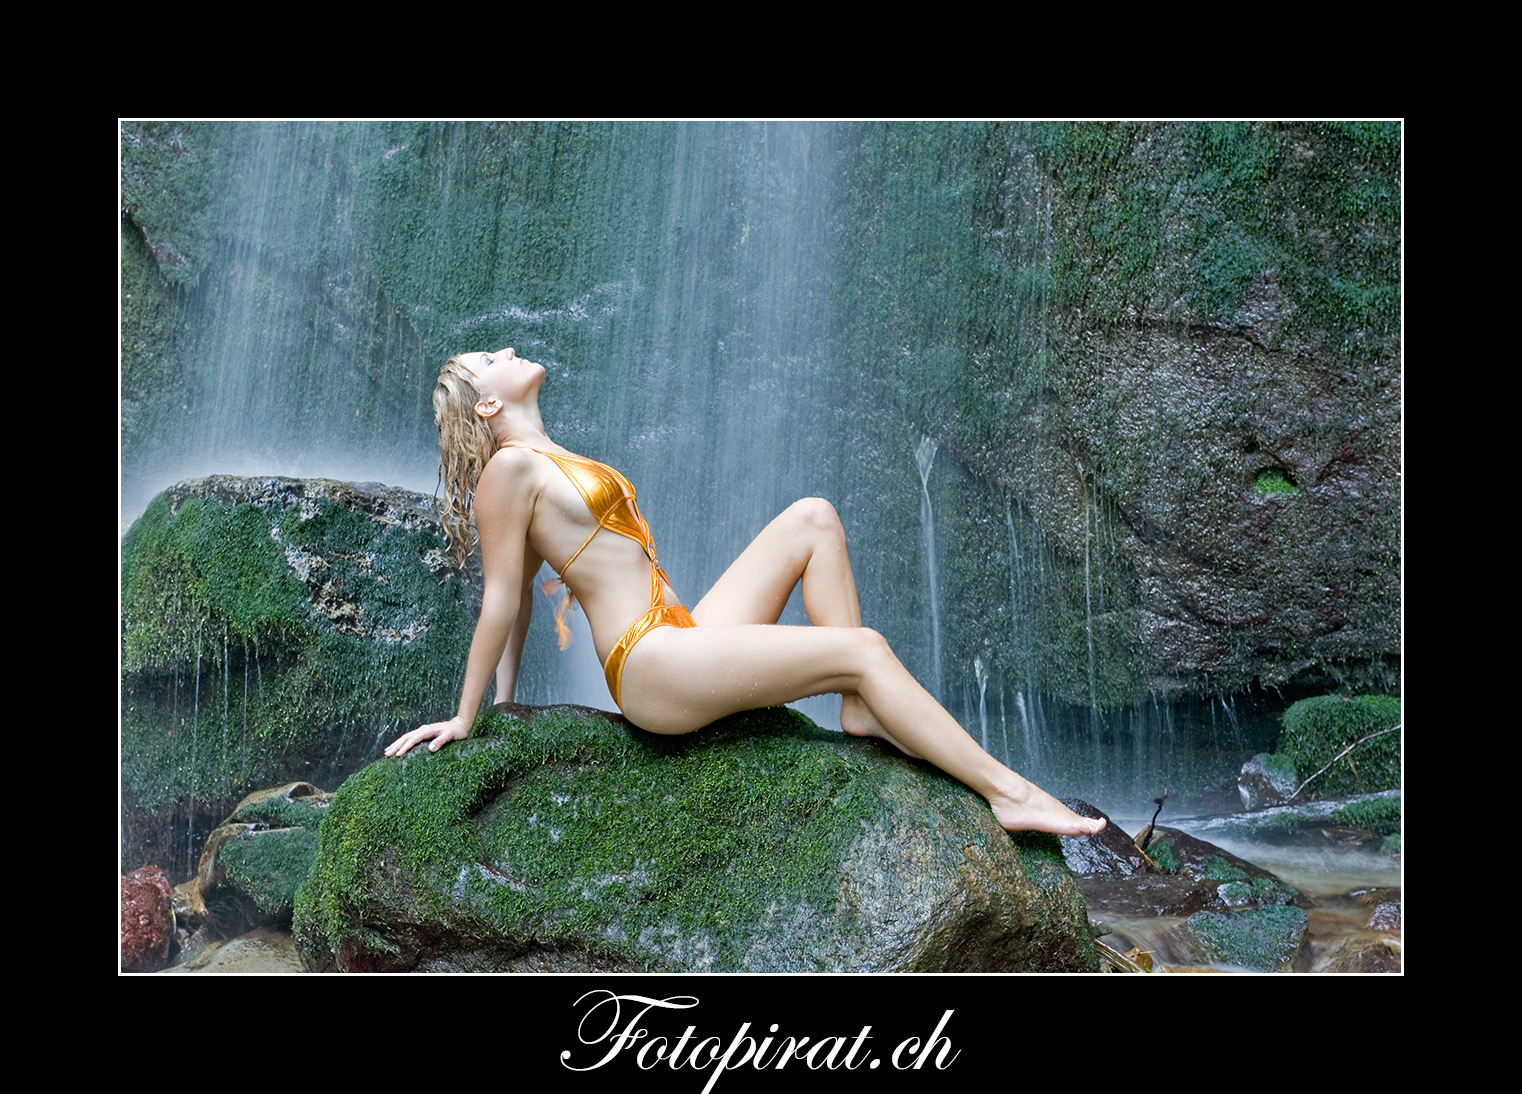 Fotoshooting, outdoor, blondes Fotomodel, Modelagentur, Wasserfallshooting, Monokini